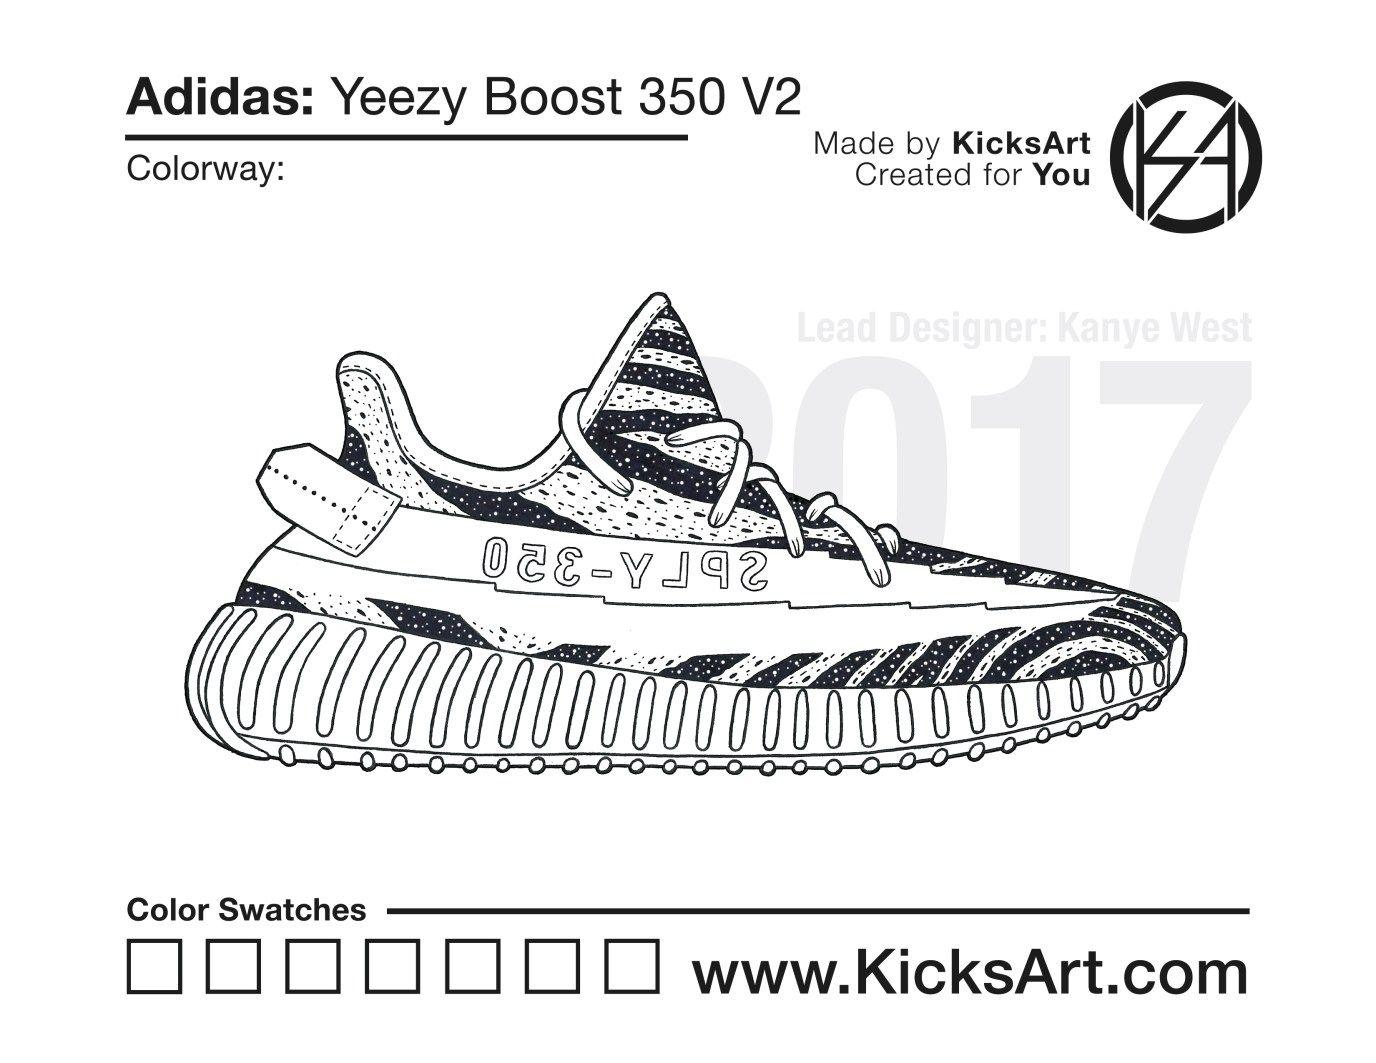 Adidas Yeezy Boost 350 V2 - KicksArt in